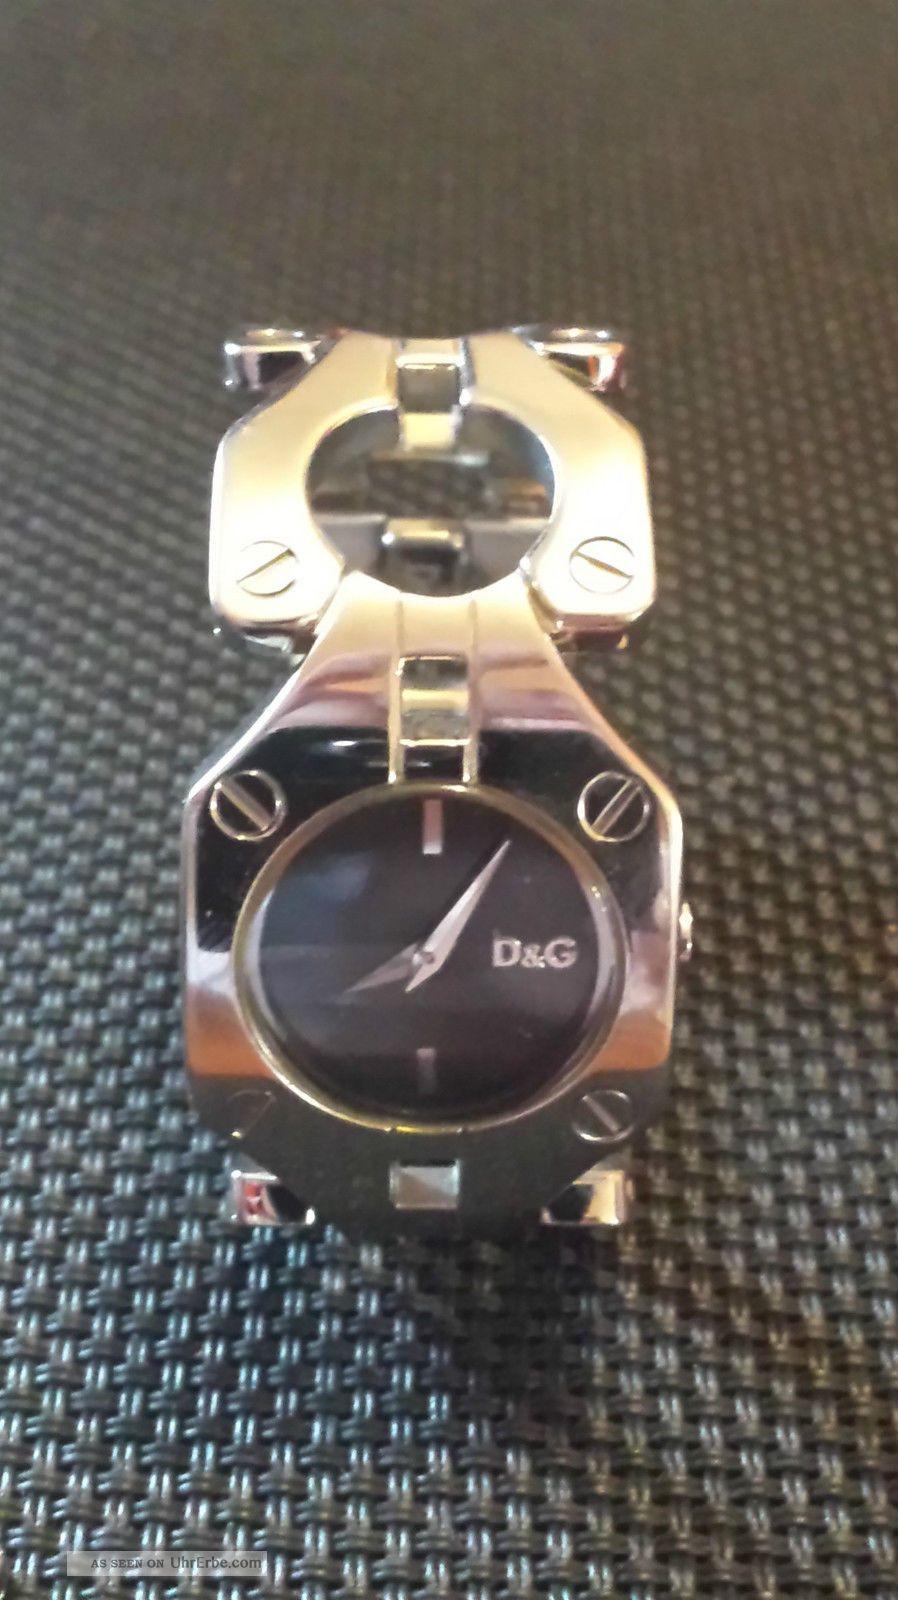 D&g Uhr Dolce & Gabbana Armbanduhr Ziffernblatt Armbanduhren Bild